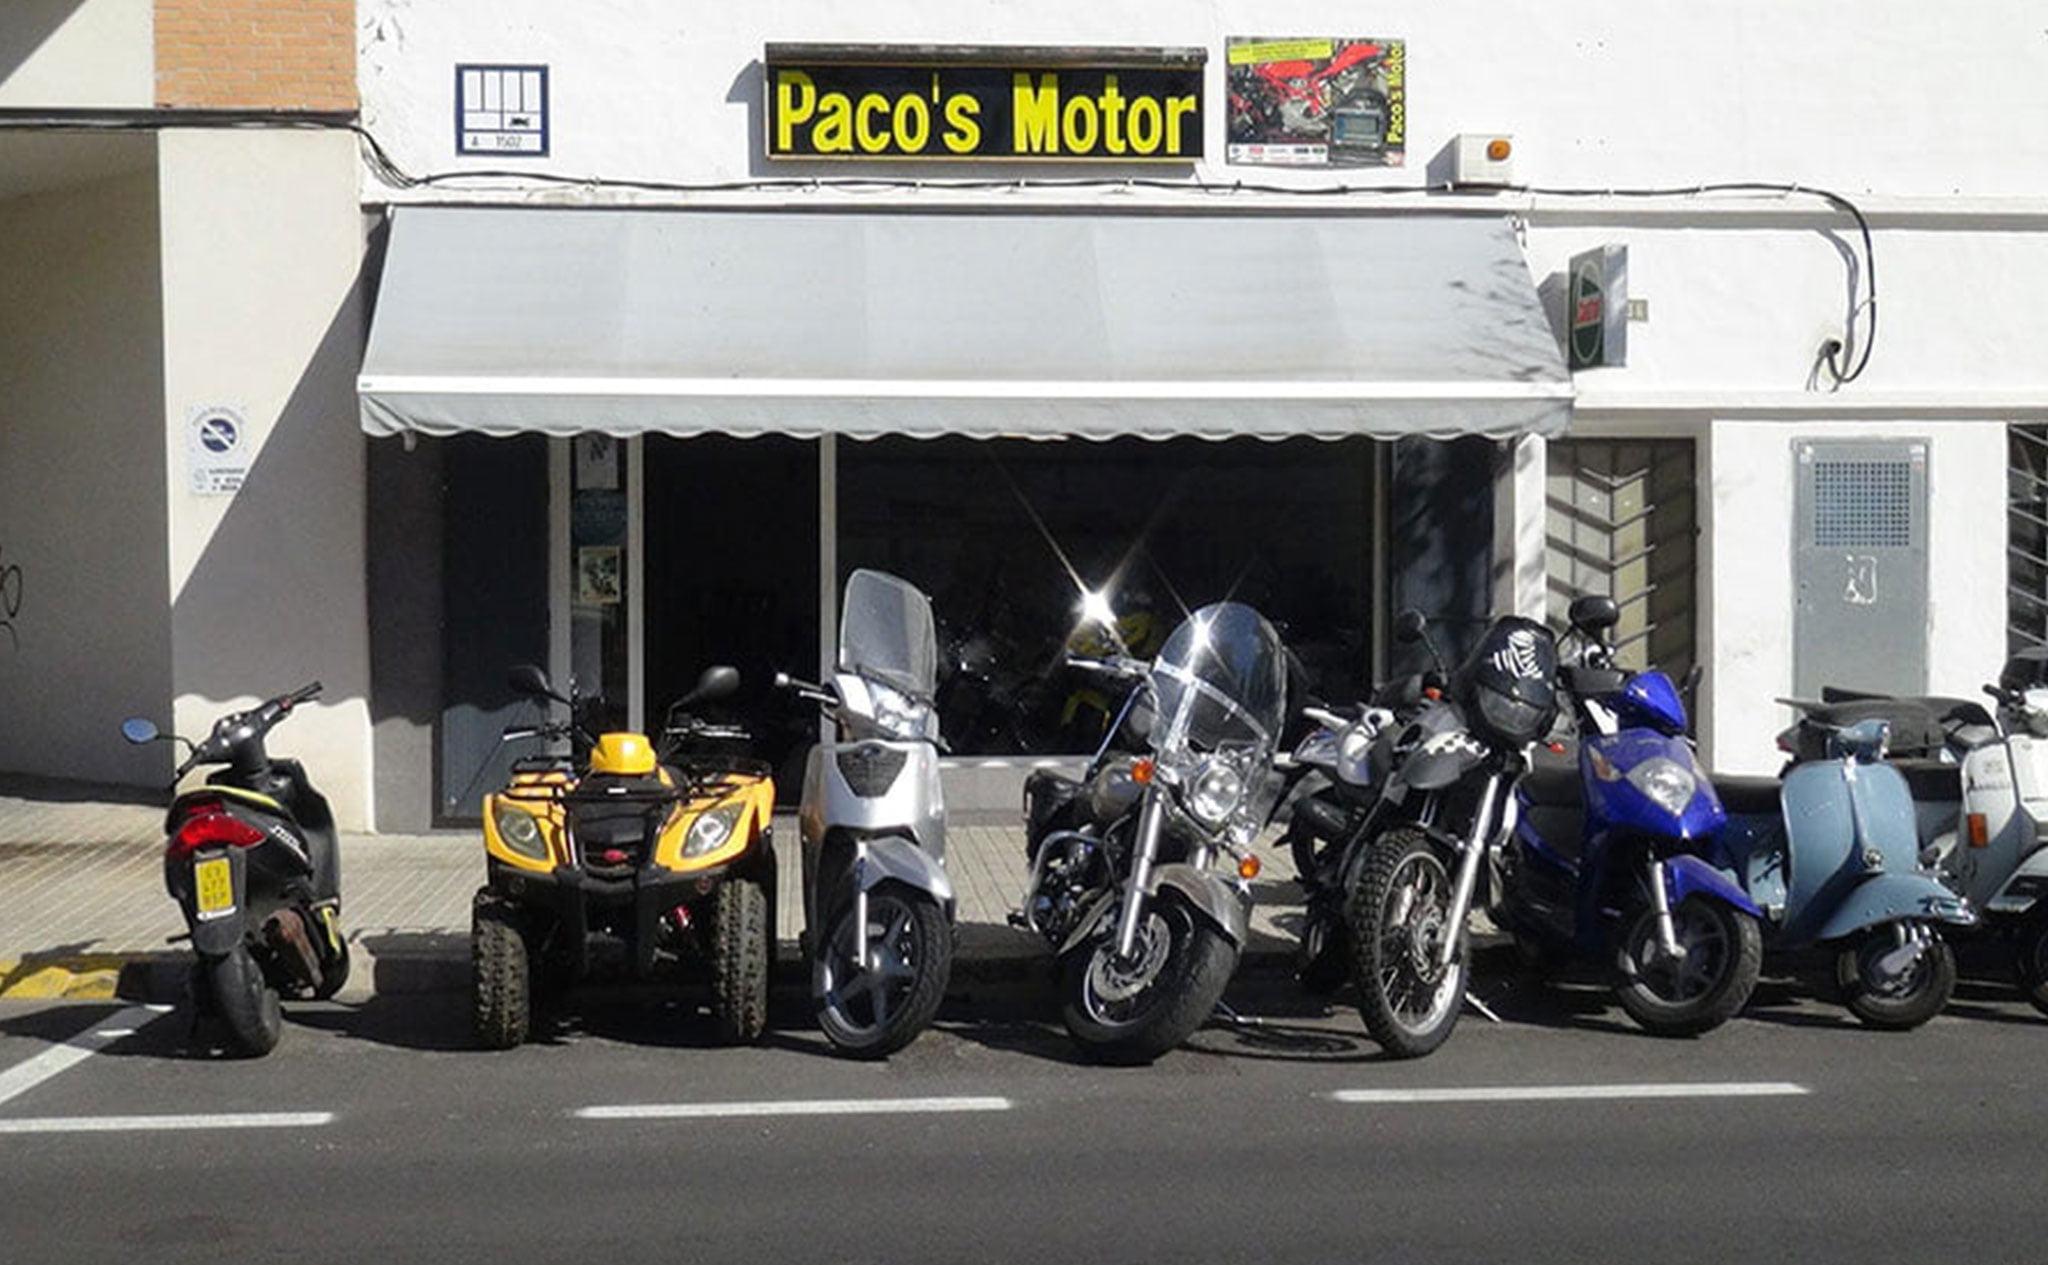 Vista del exterior de Paco's Motor